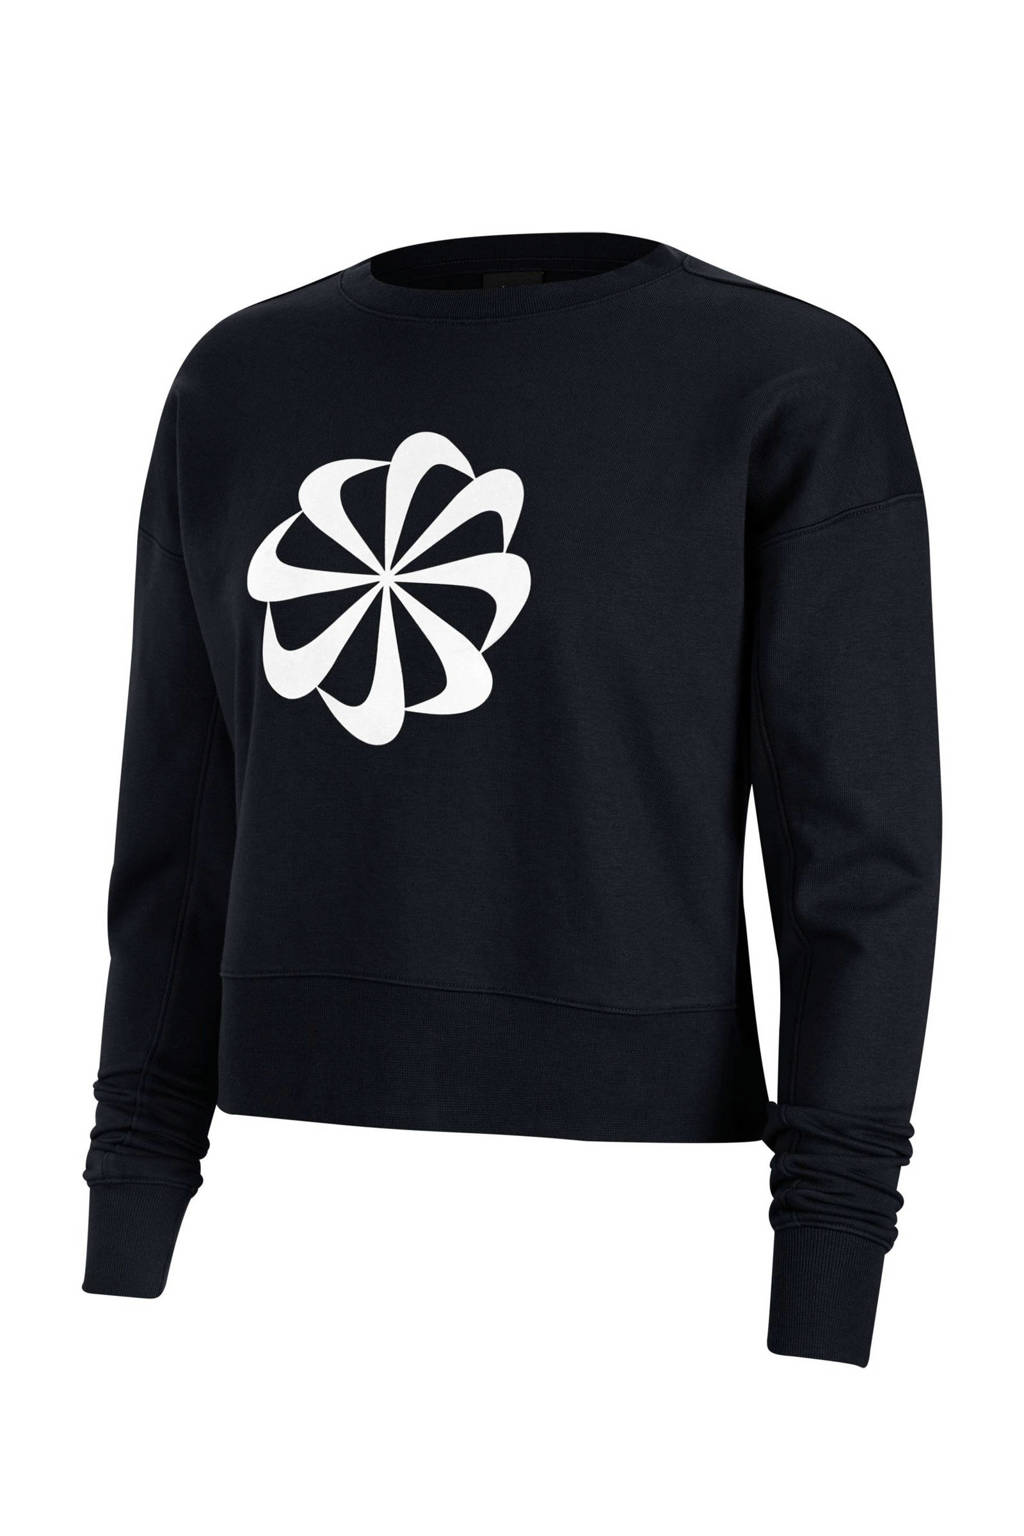 Nike cropped sportsweater zwart, Zwart